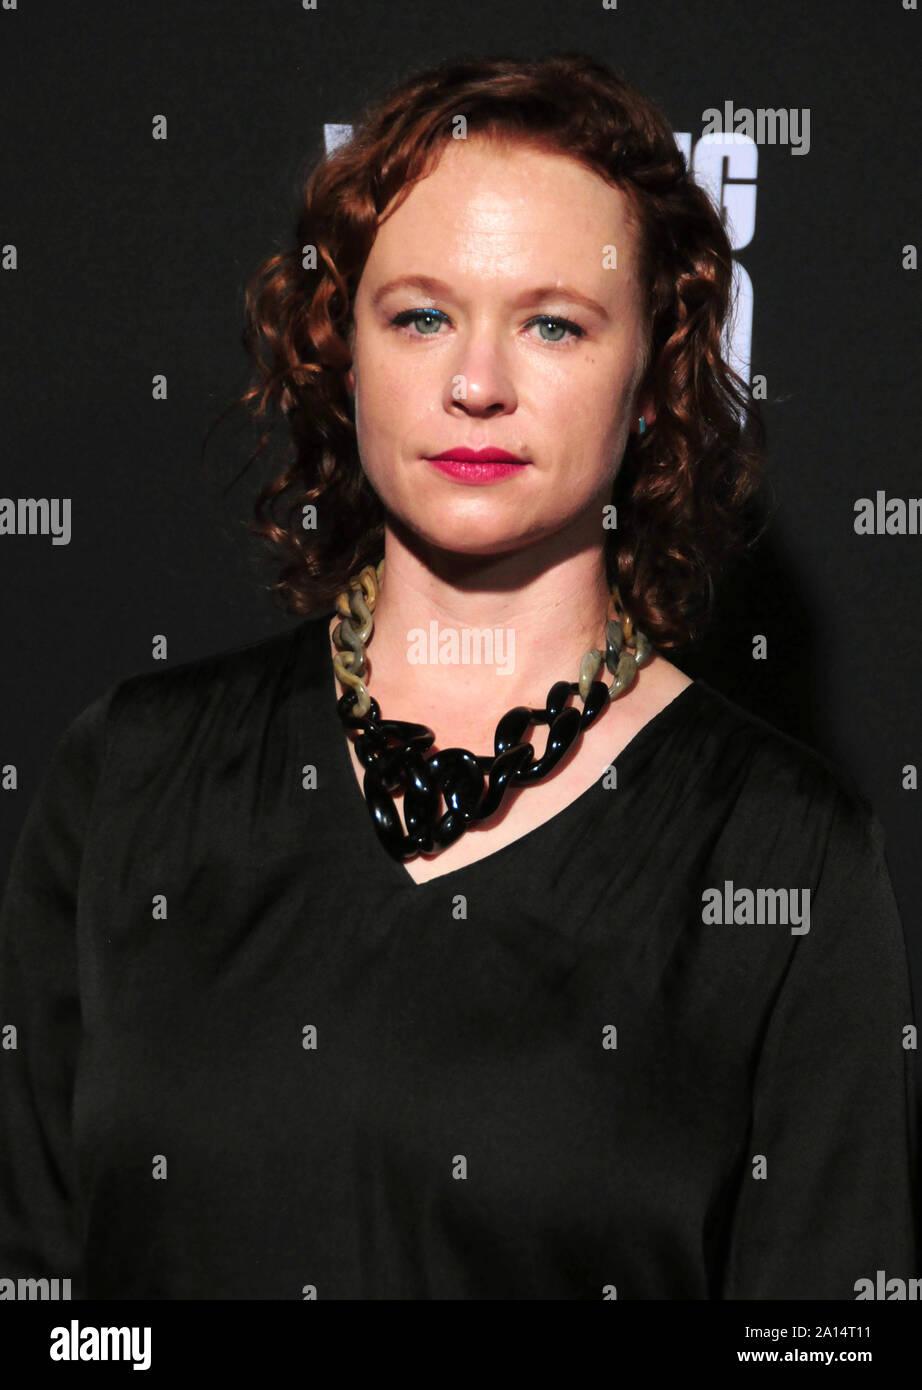 Actress Thora Birch Stock Photos Actress Thora Birch Stock